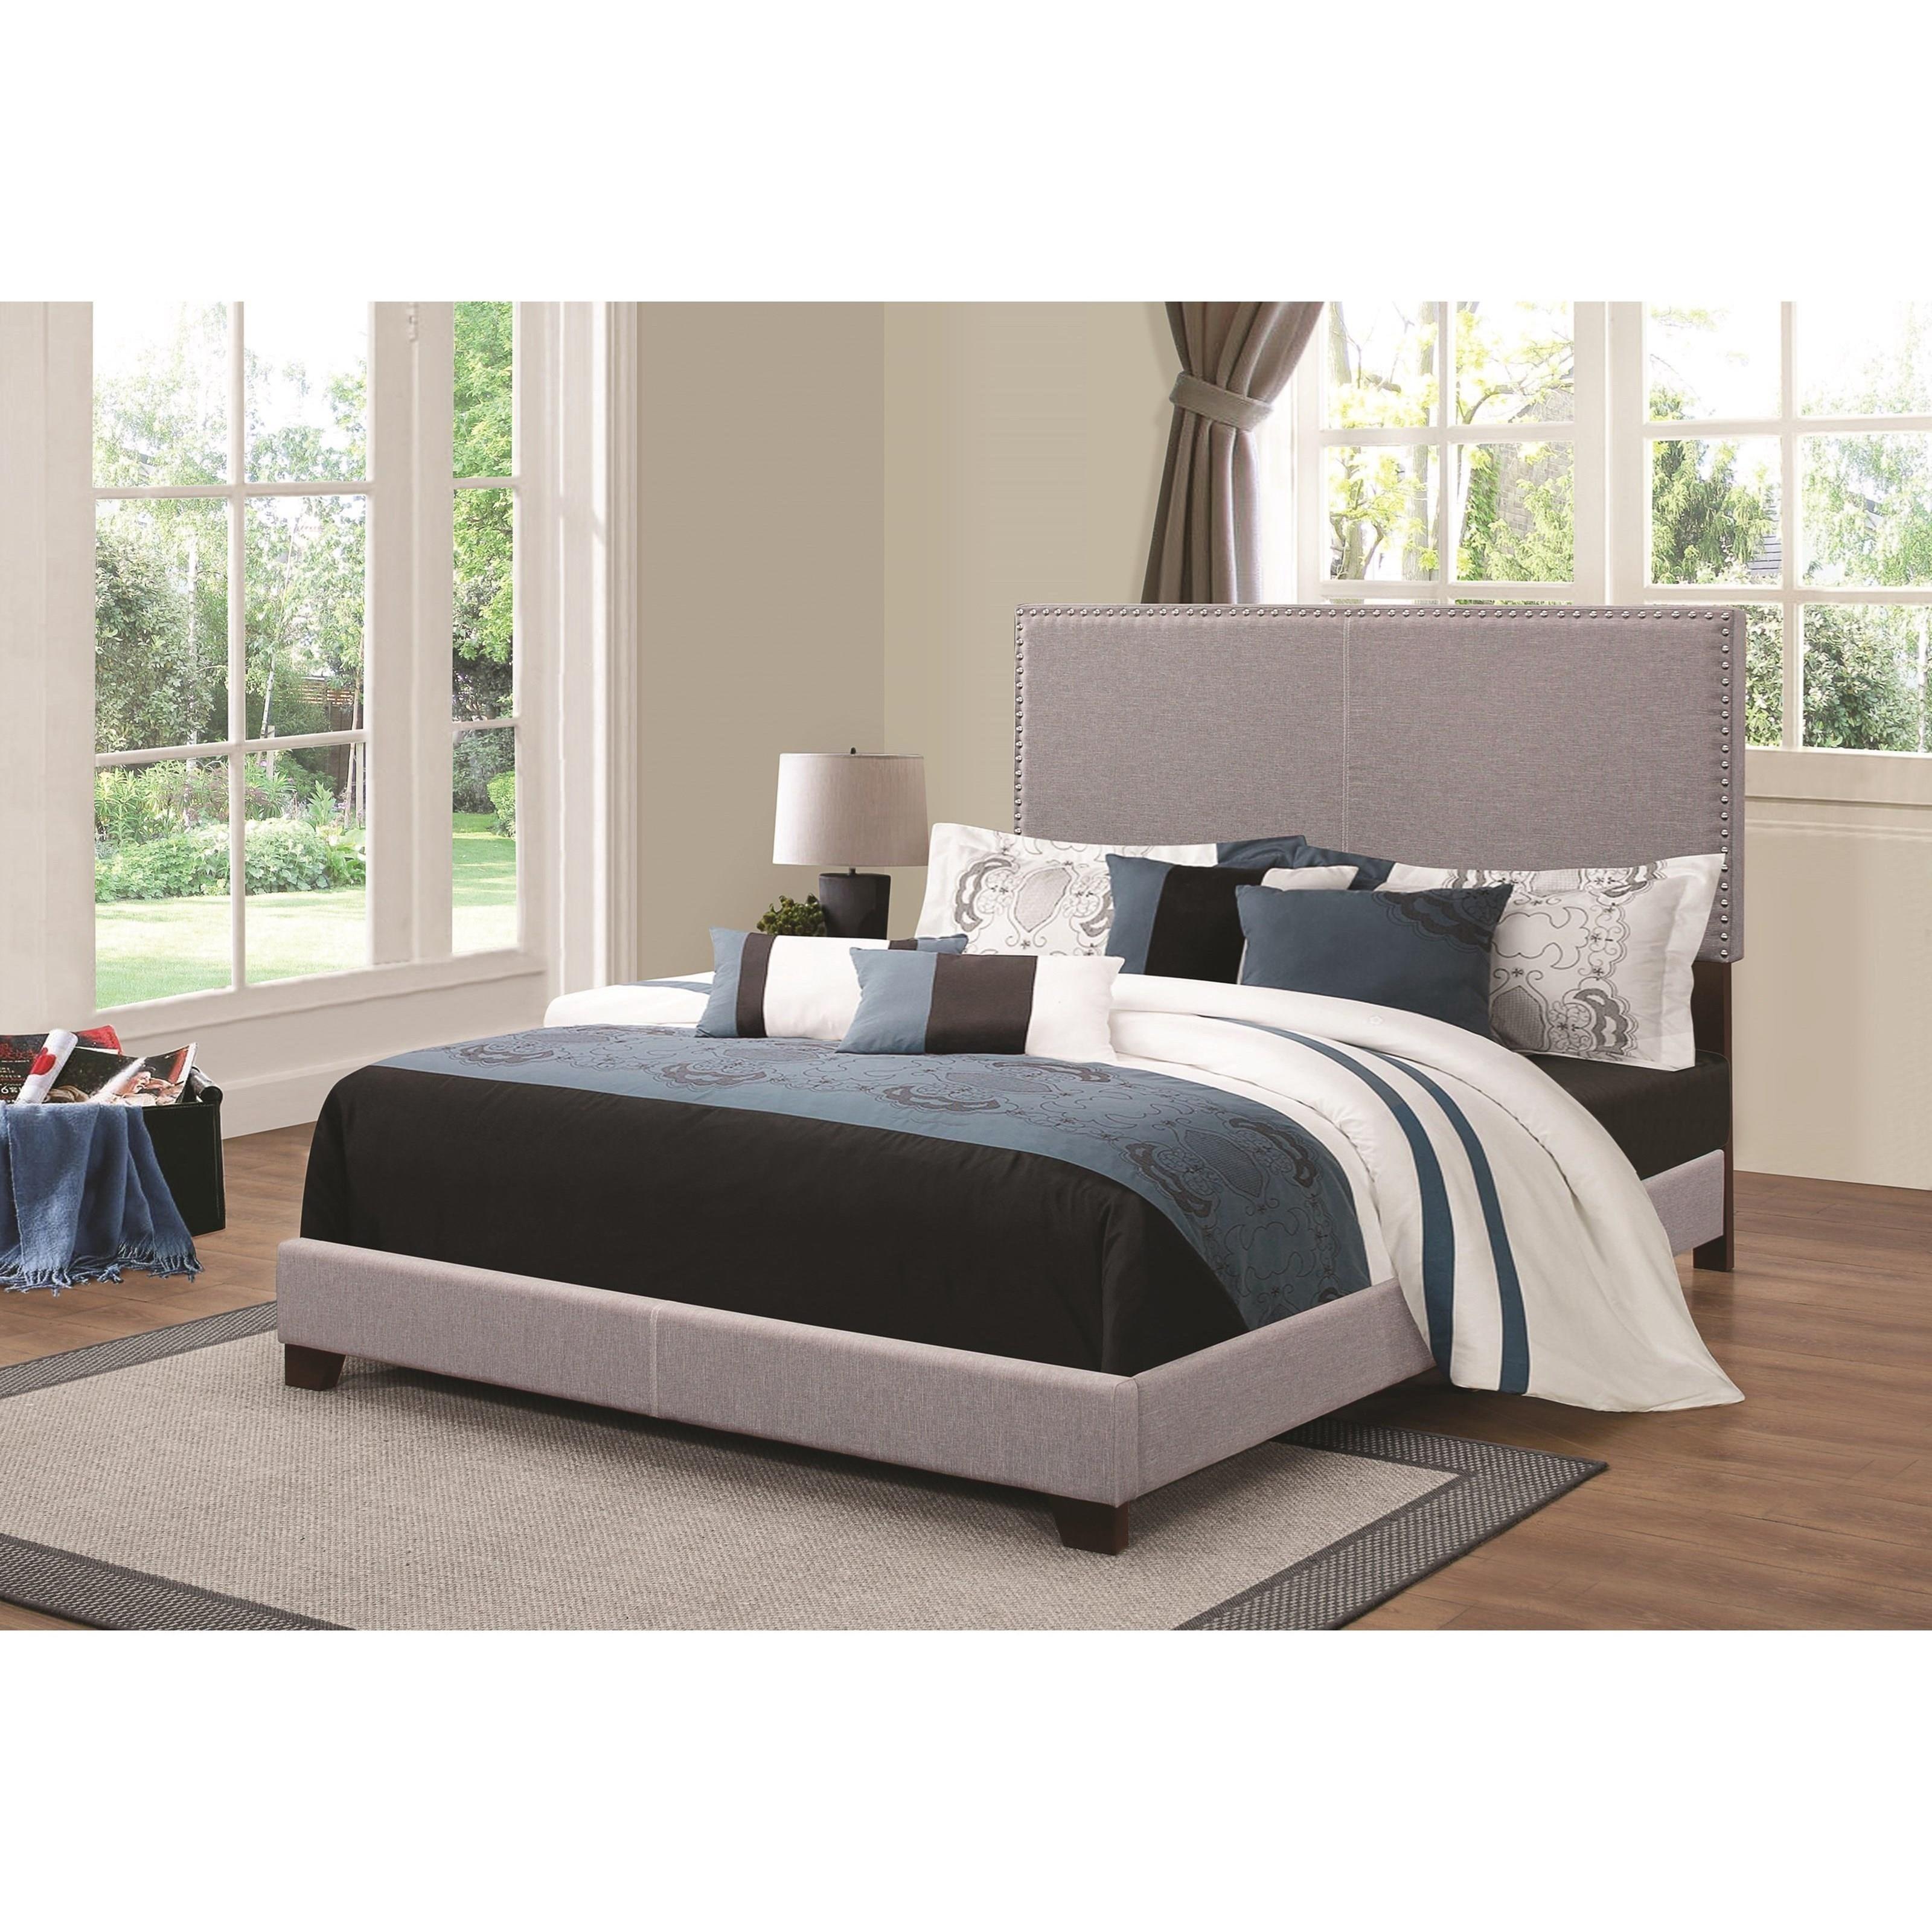 Coaster Upholstered Beds Full Bed - Item Number: 350071F